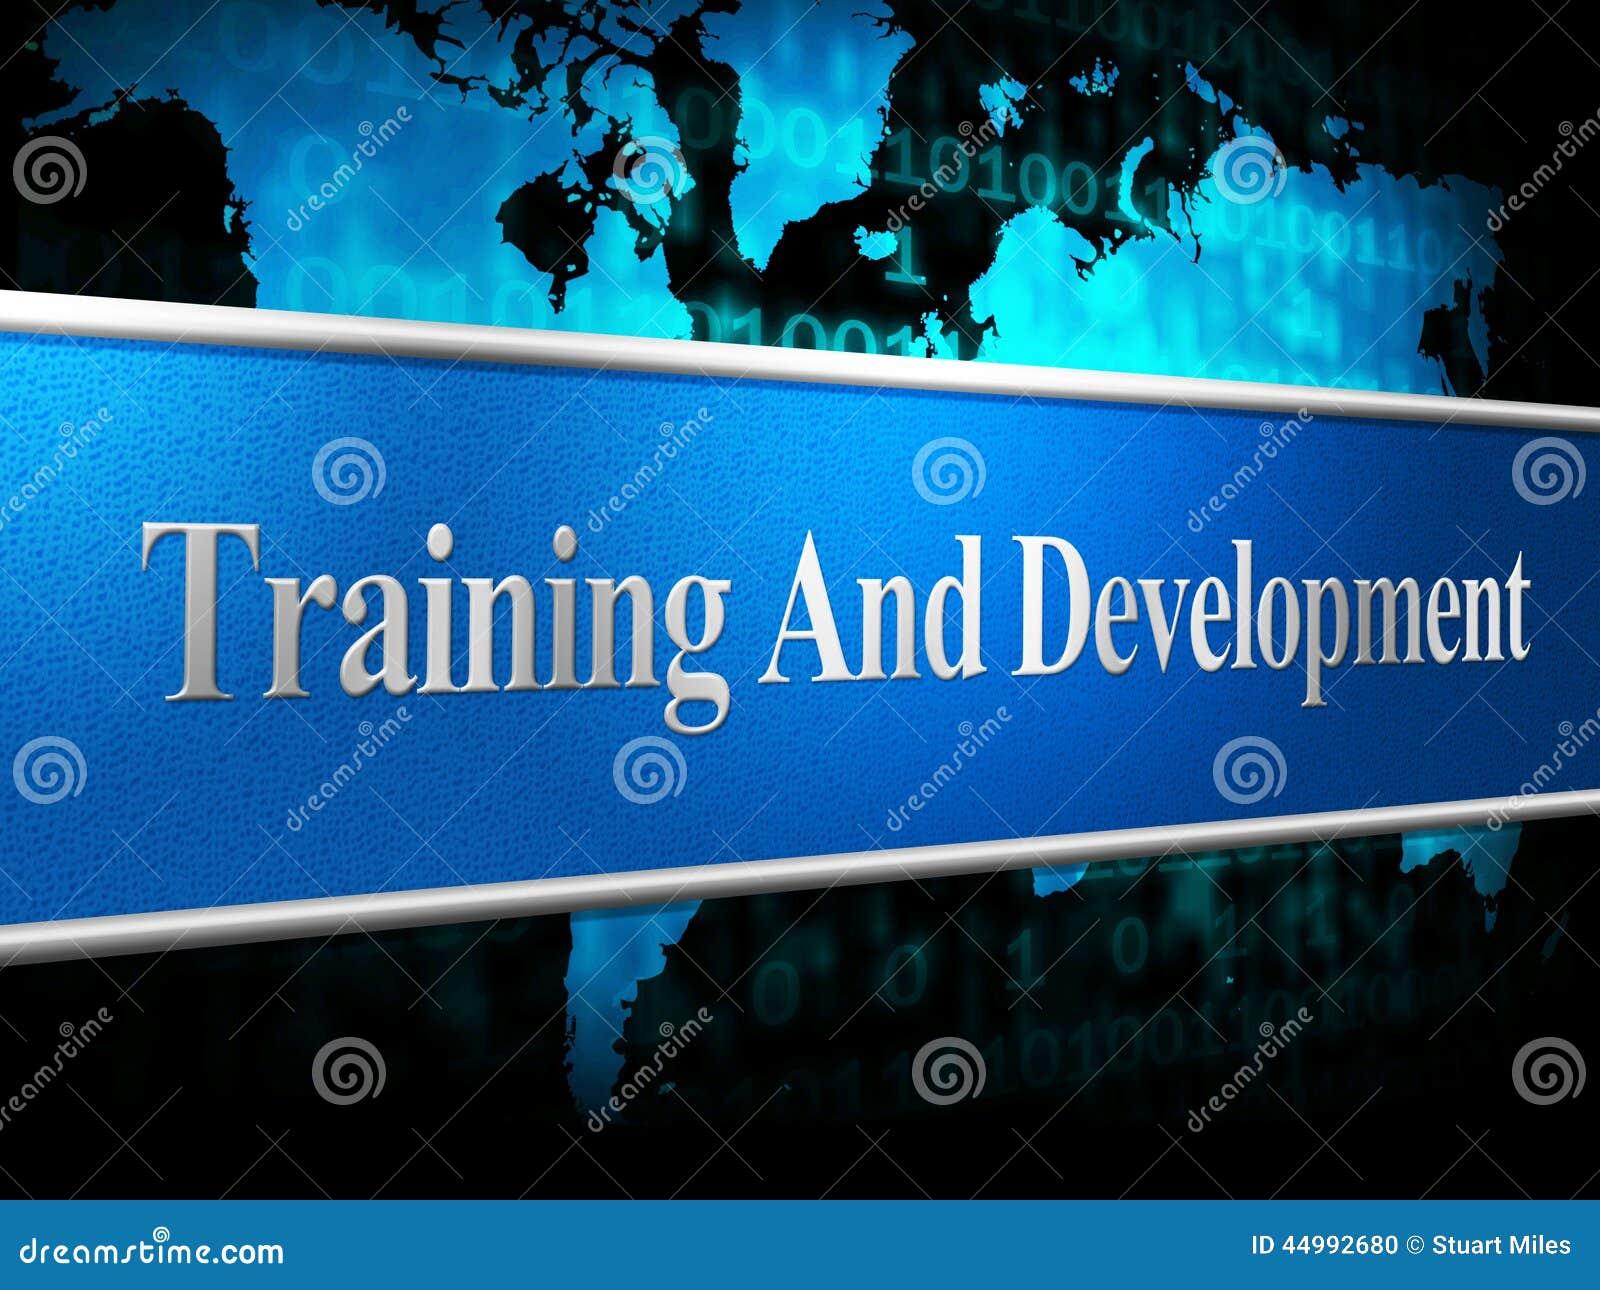 training and development stock illustration